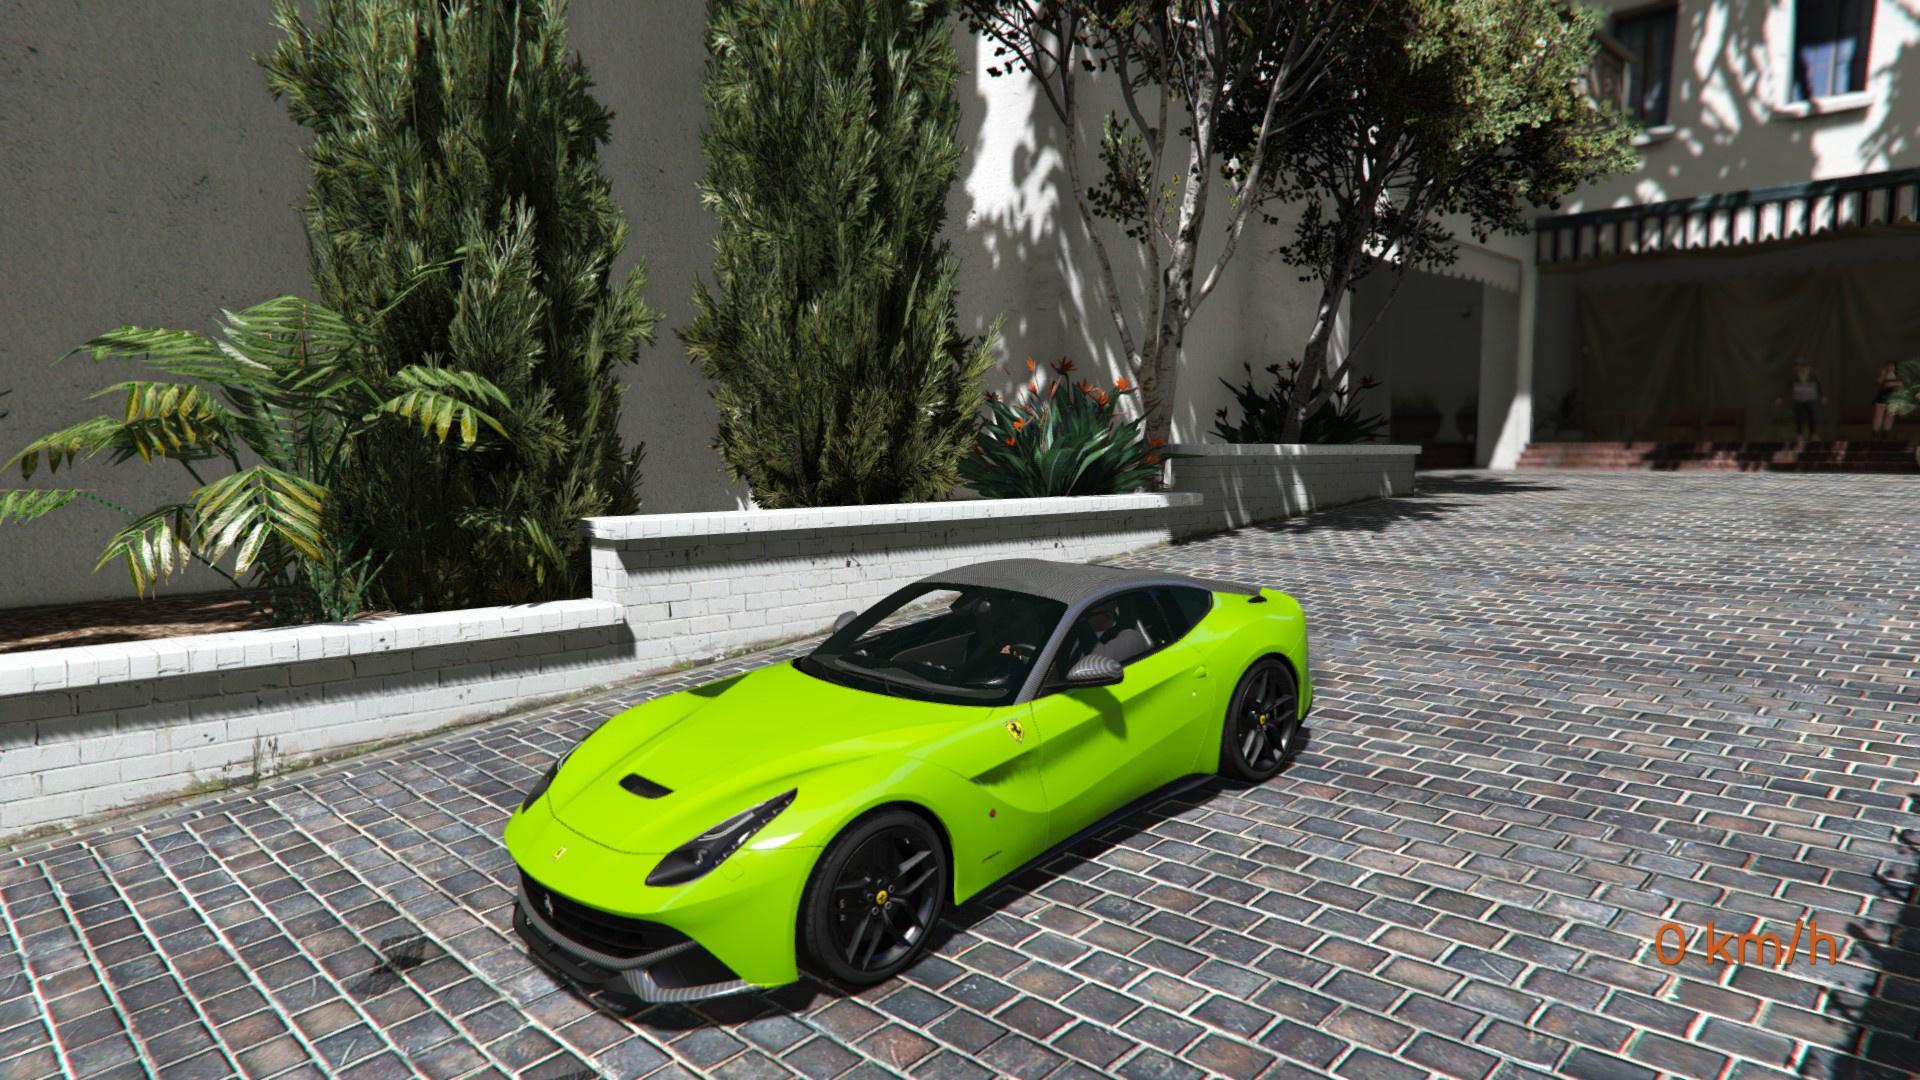 ferrari f12 berlinetta 2013 yca oakley design 2 more pj\u0027s gta5794cd4 gta5 2017 03 01 15 09 36